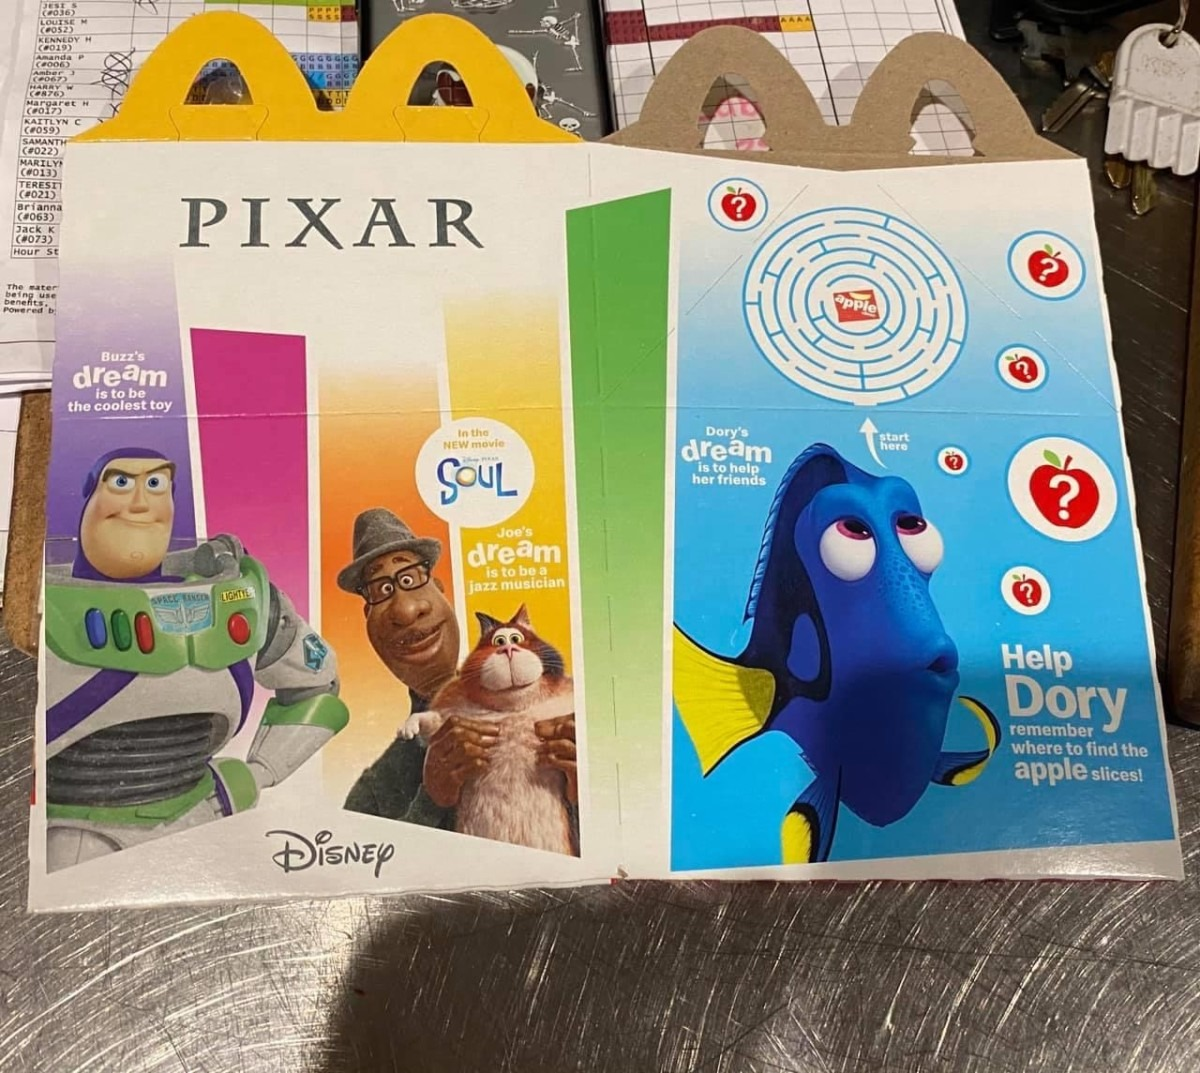 McDonald's Happy Meals Featuring Pixar Characters! 3